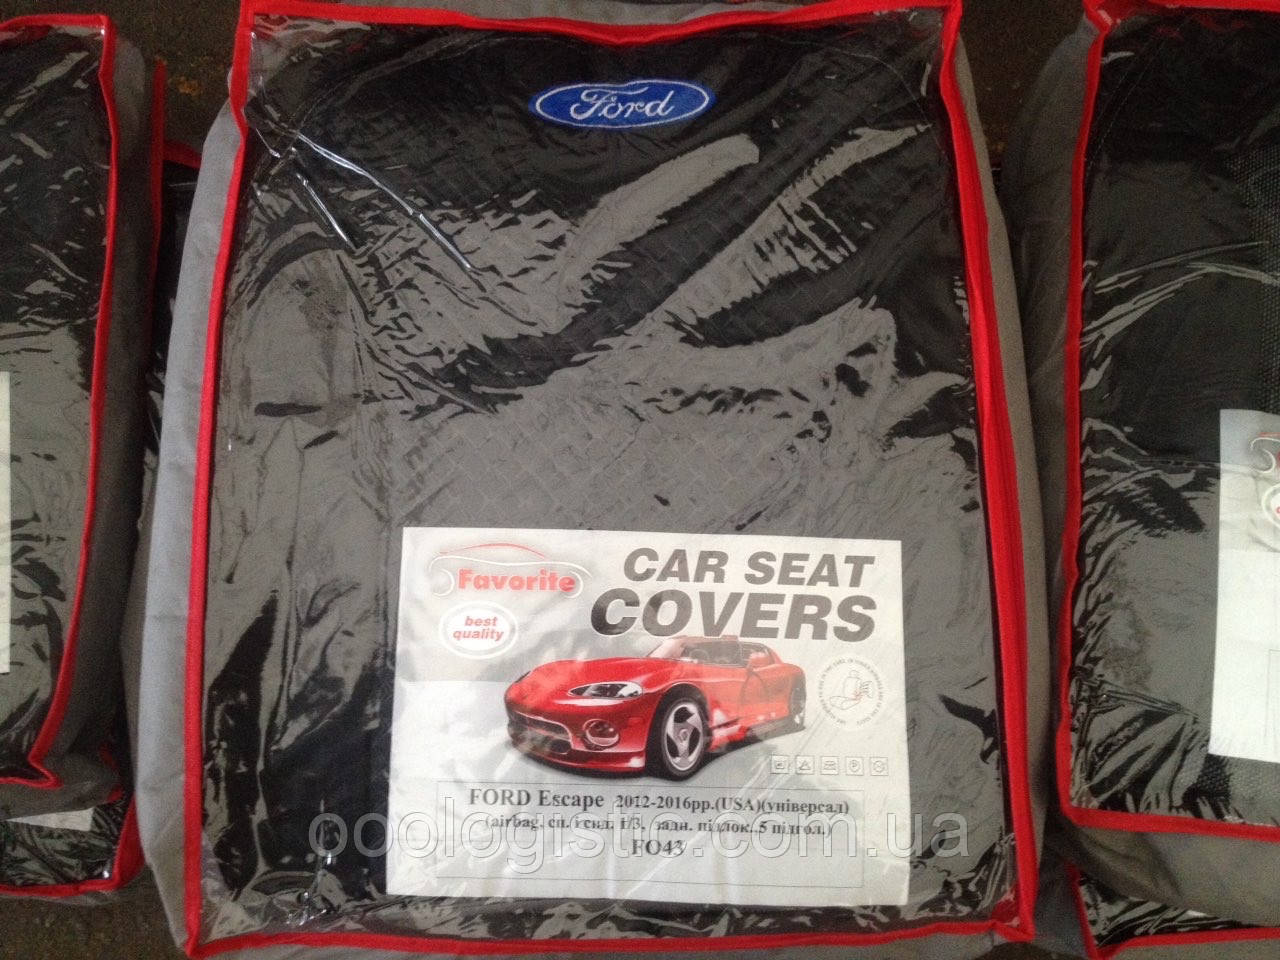 Авточехлы Favorite на Ford Escape 2012-2016 (USA)универсал